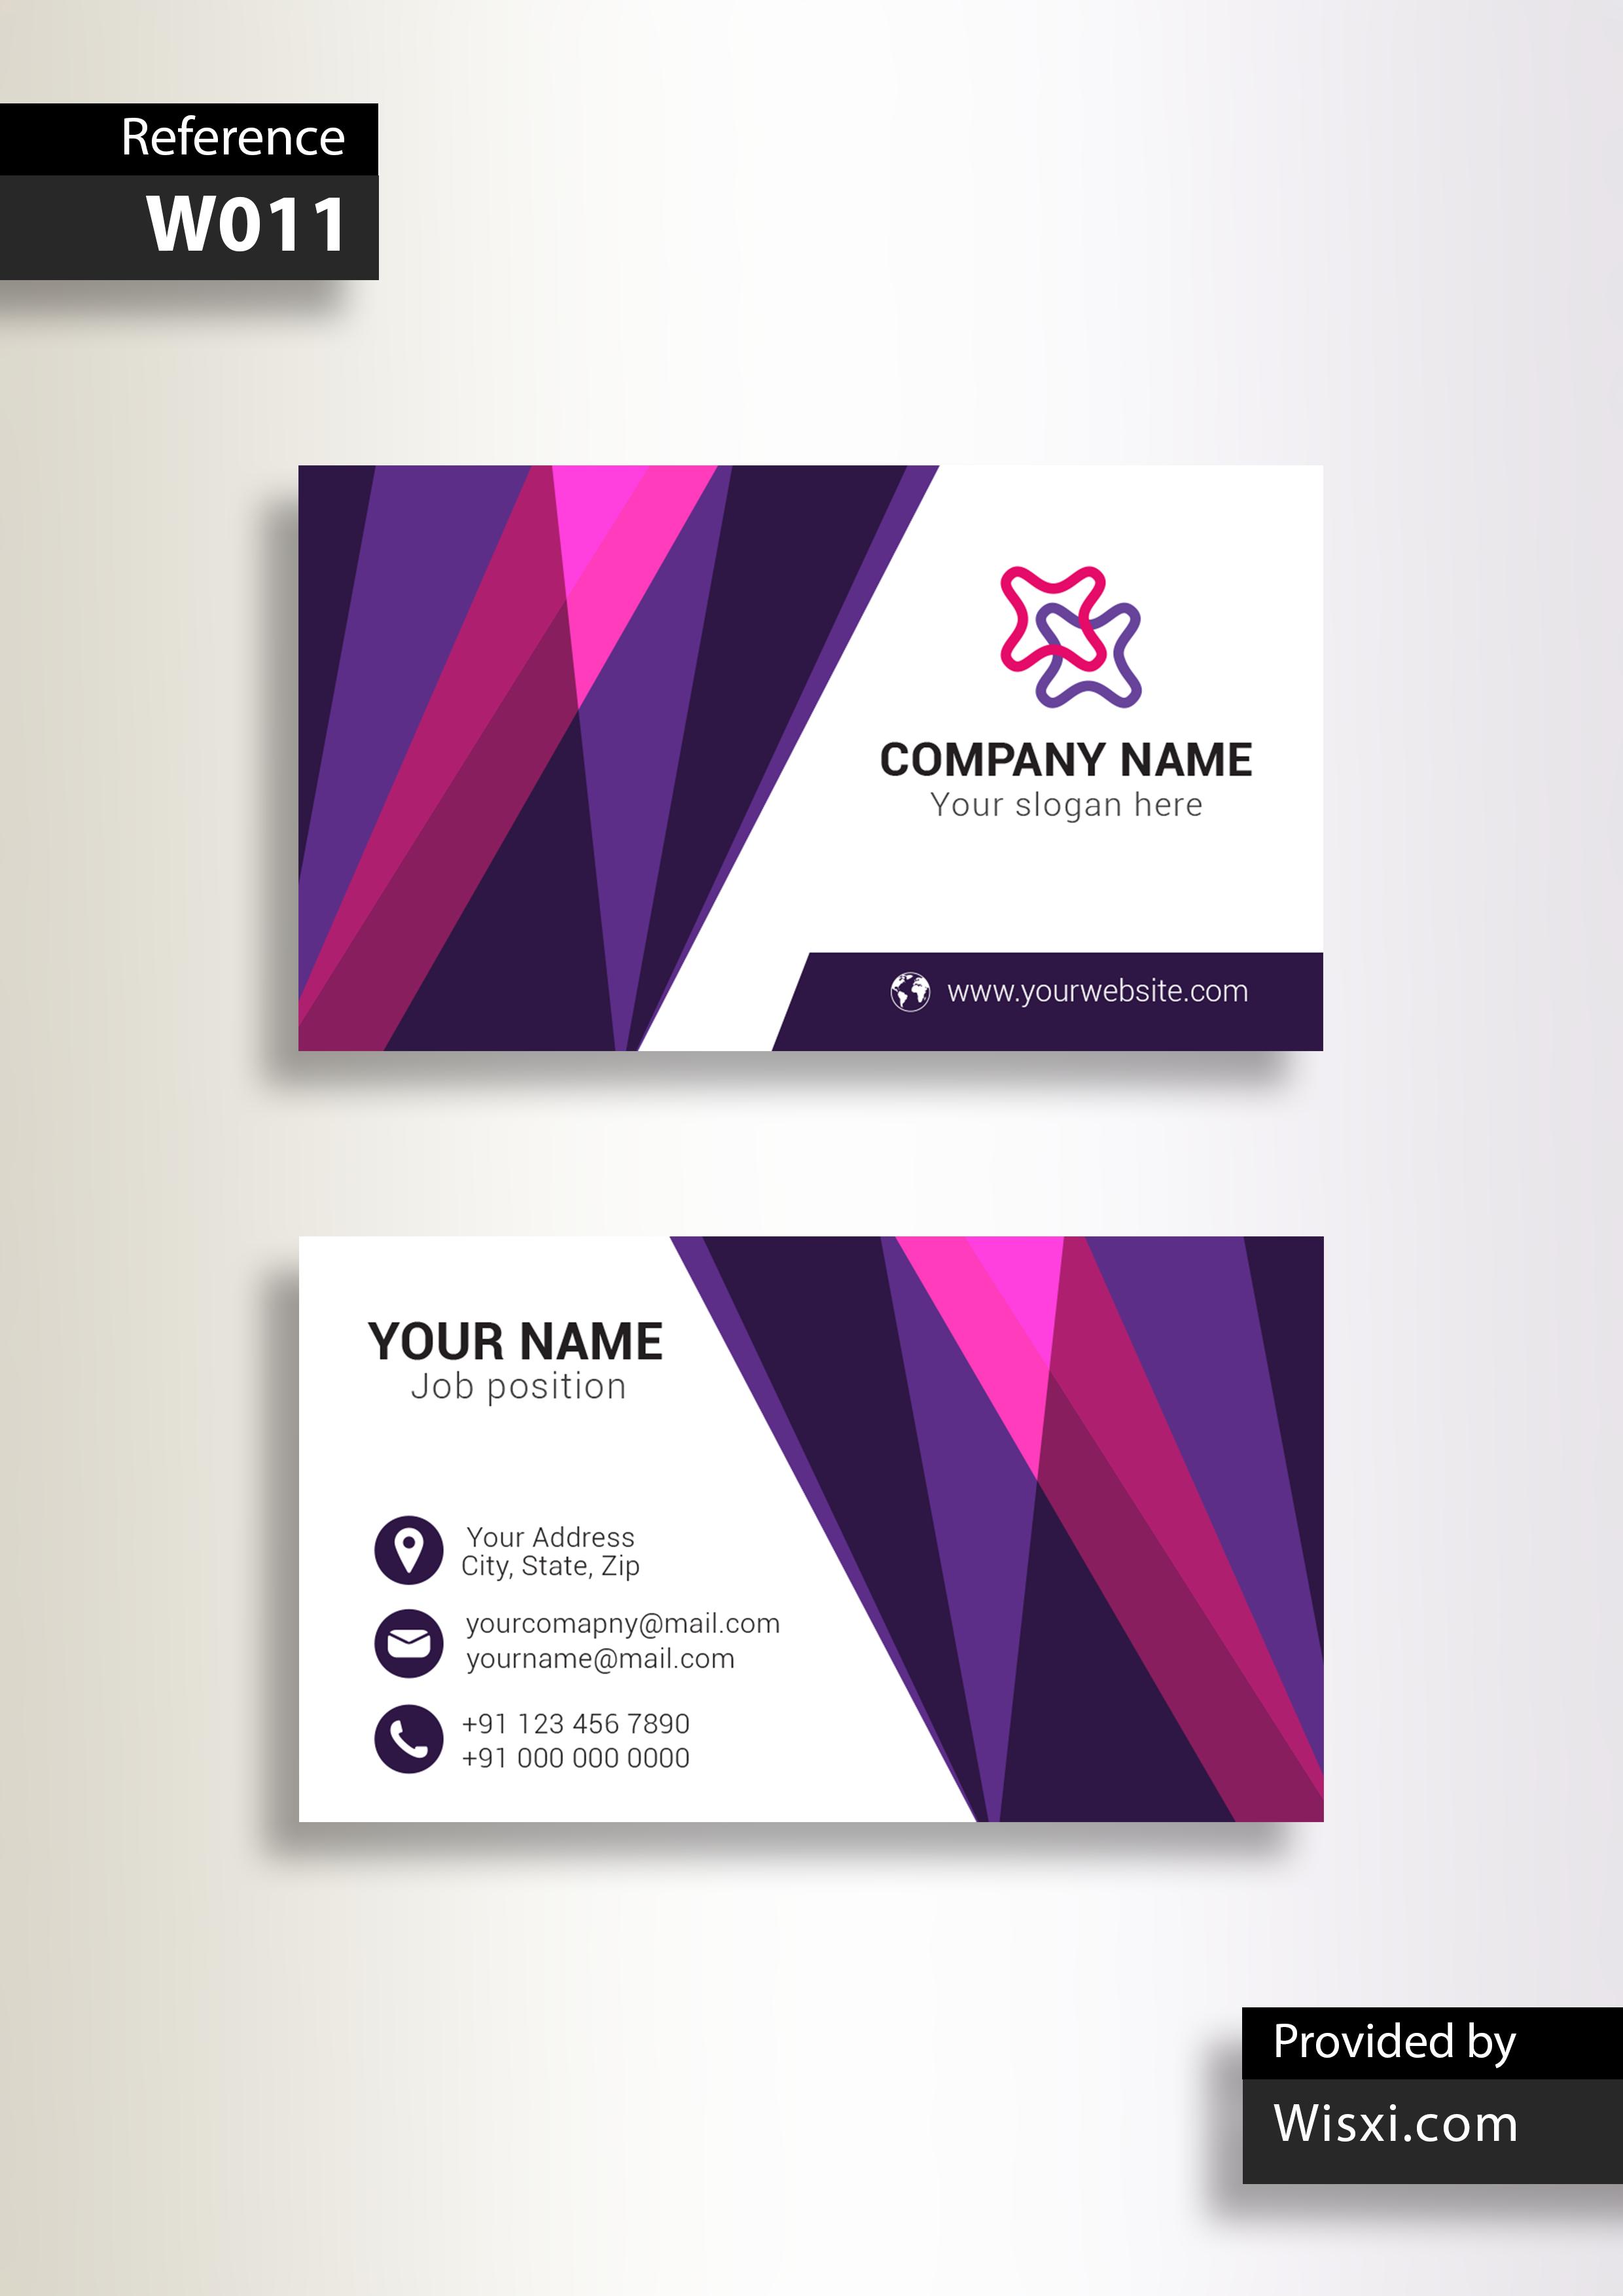 Vendeurpro I Will Design Your Business Card For 15 On Fiverr Com Cards Design Business Cards